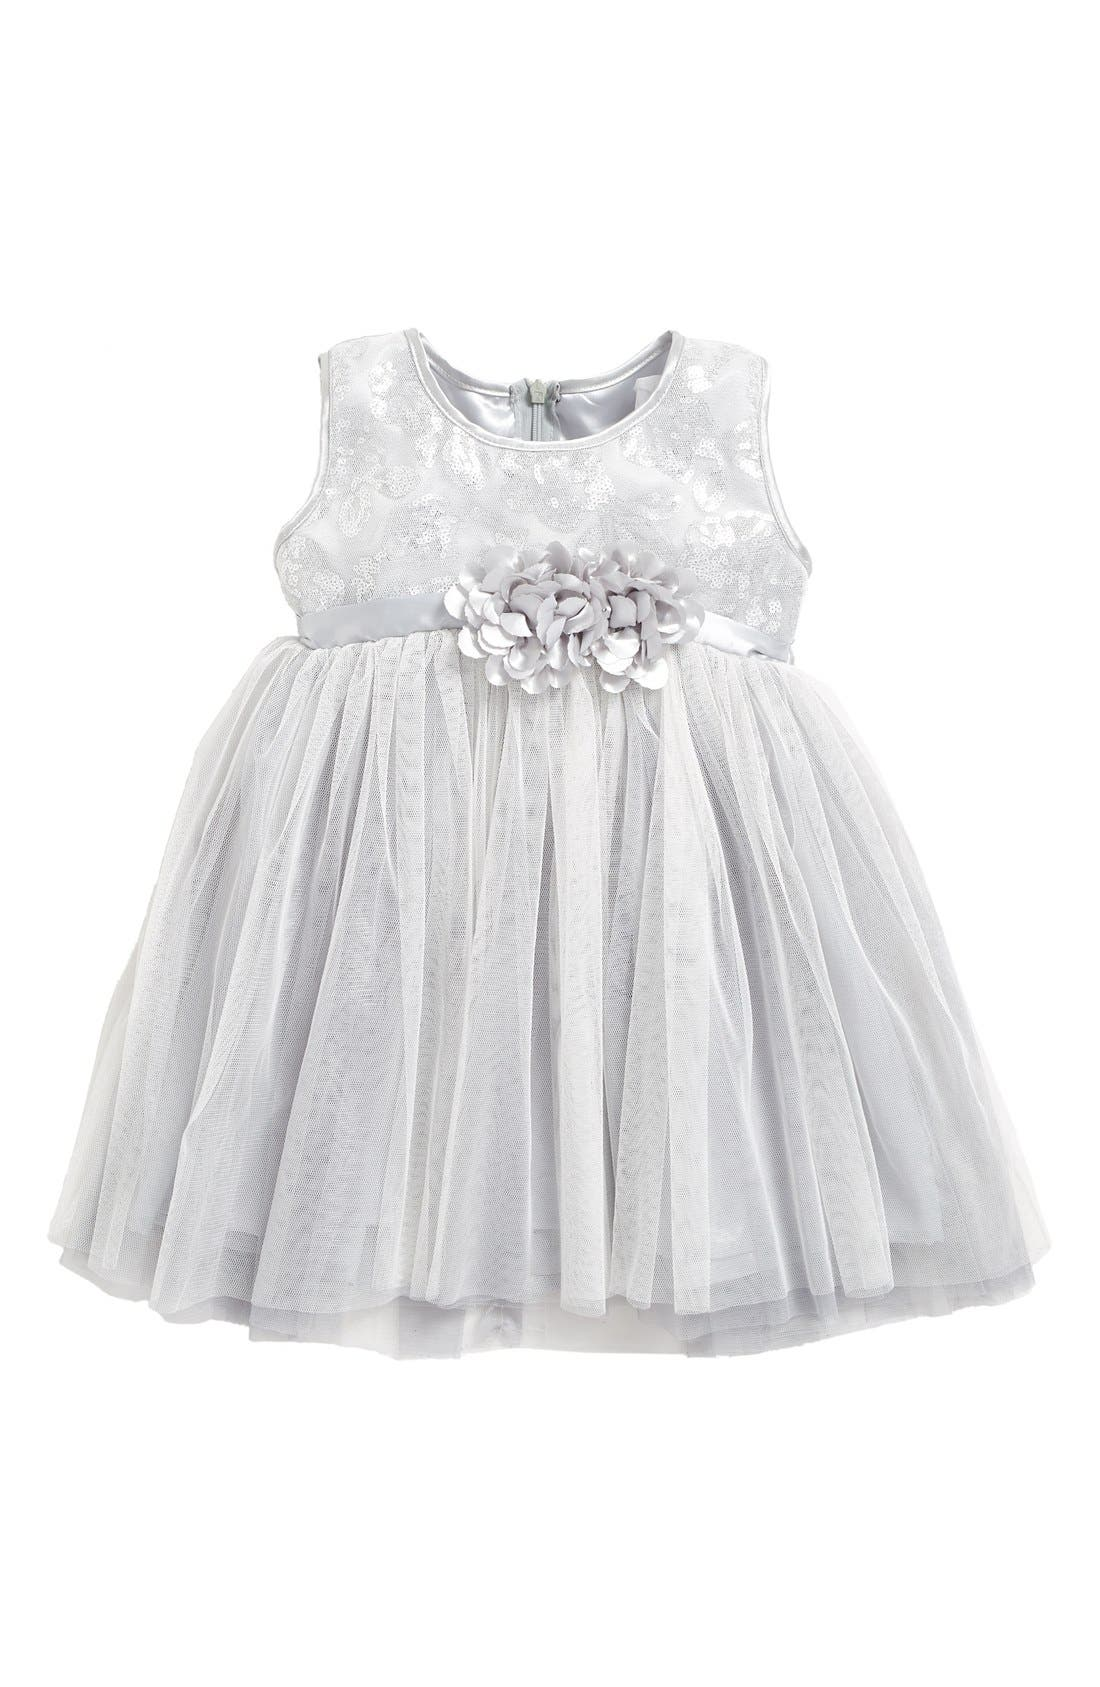 Empire Waist Tulle Dress,                             Main thumbnail 1, color,                             040